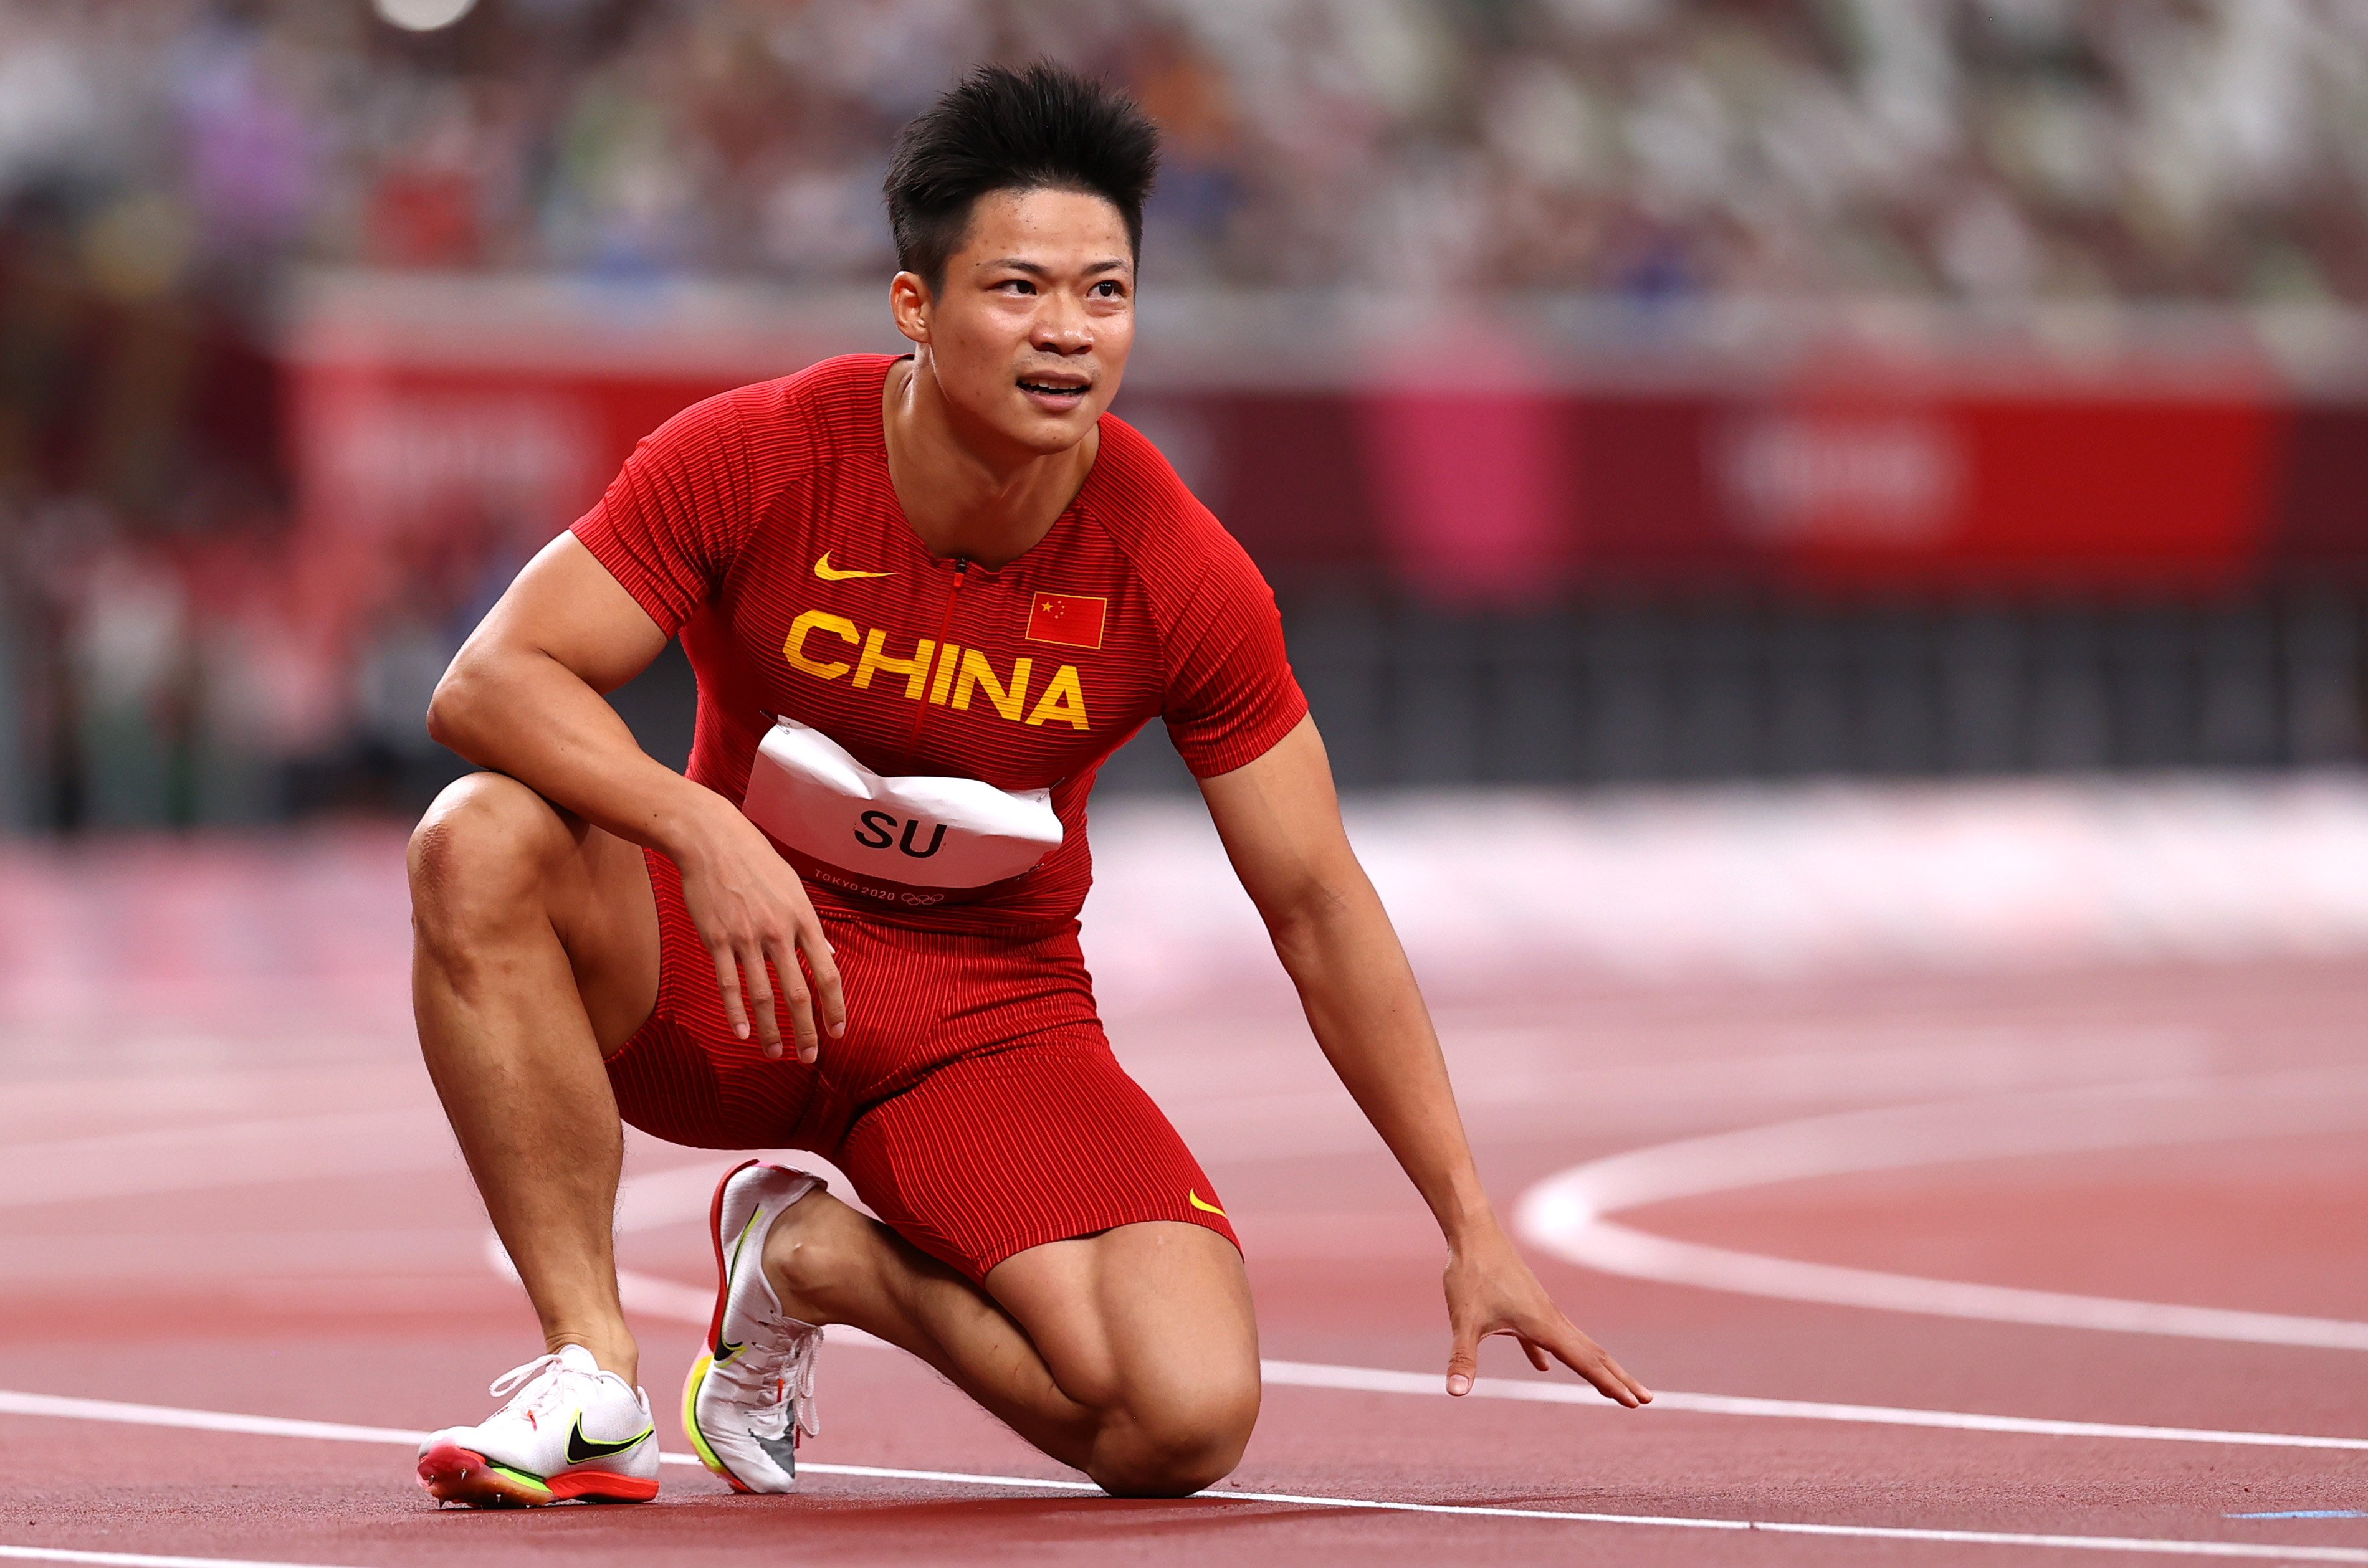 Tokyo 2020 Olympics - Athletics - Men's 100m - Final - OLS - Olympic Stadium, Tokyo, Japan - August 1, 2021. Su Bingtian of China reacts REUTERS/Andrew Boyers/File Photo